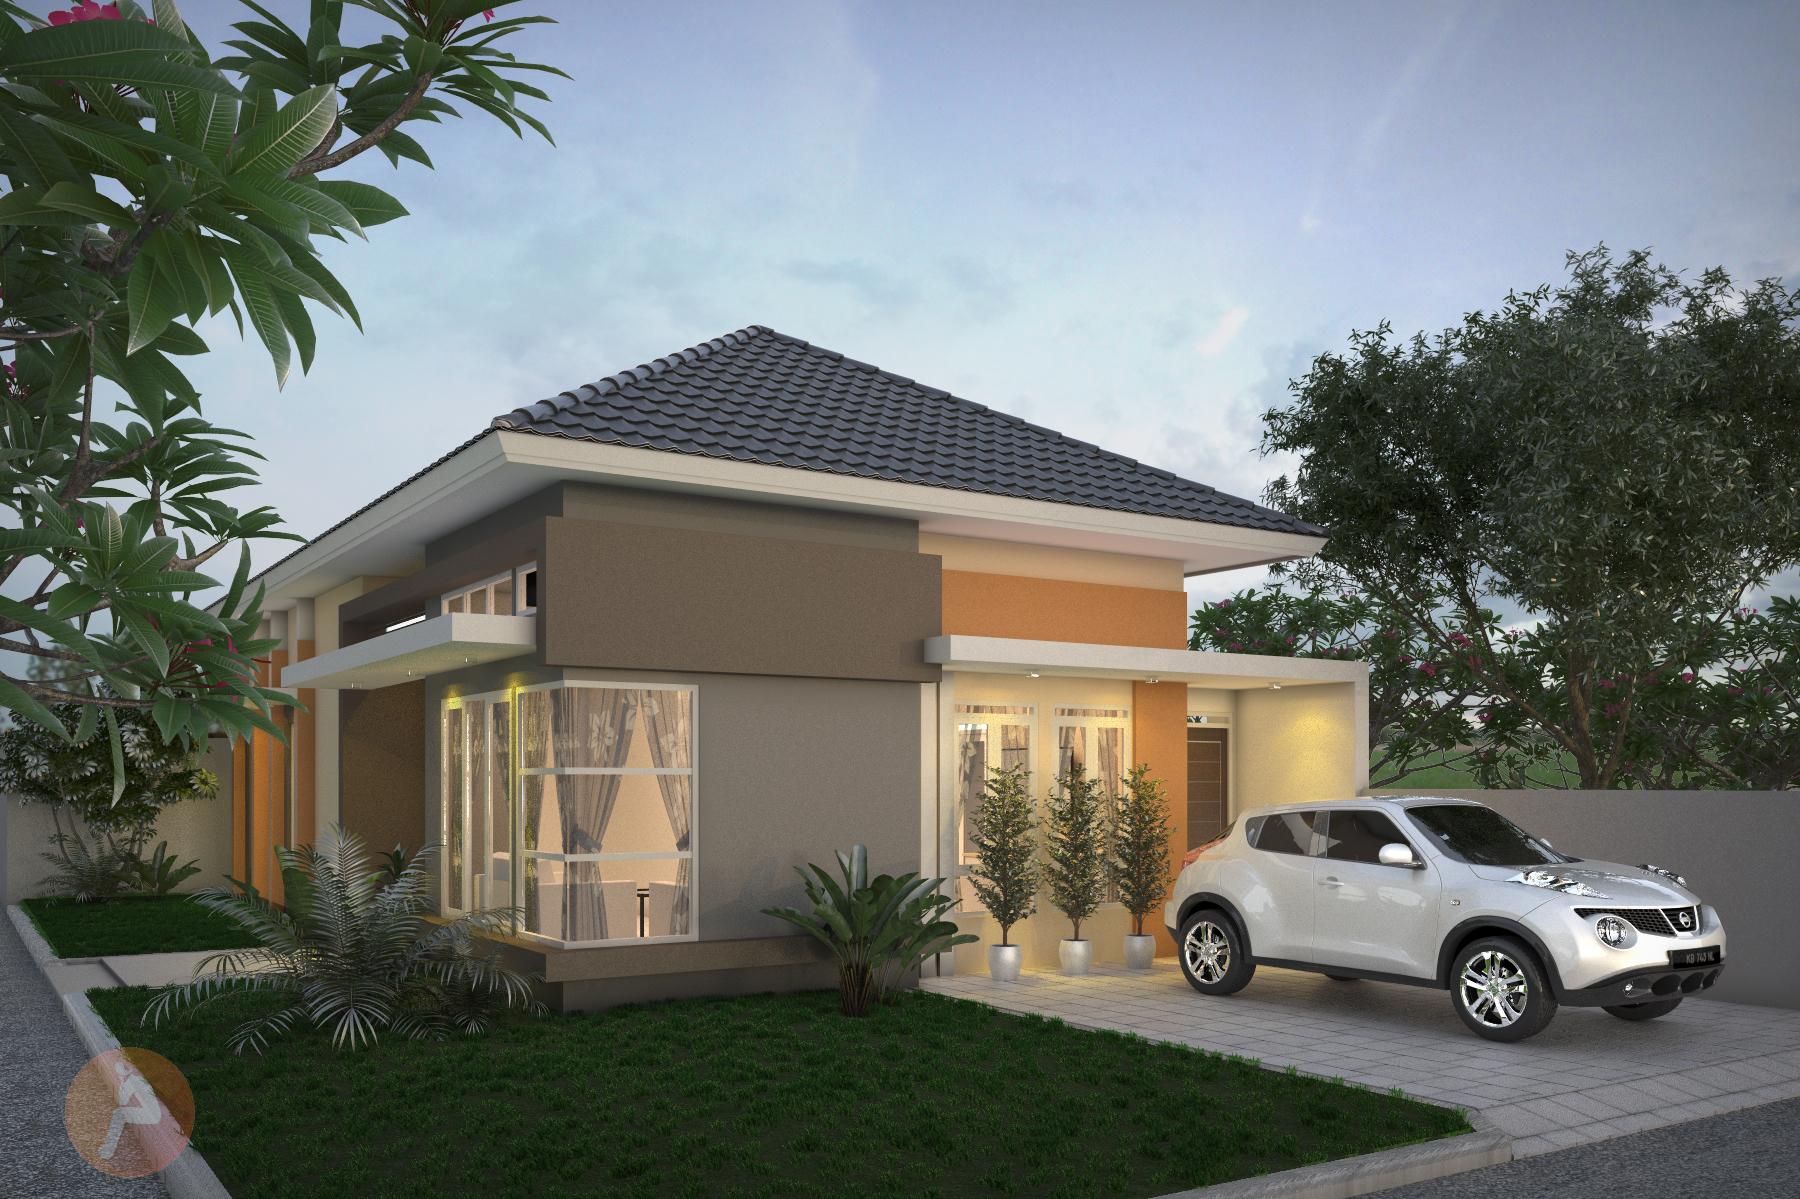 Sqm House Design Mr Ewas House By Jae Arif On Guru - House design 80 sqm